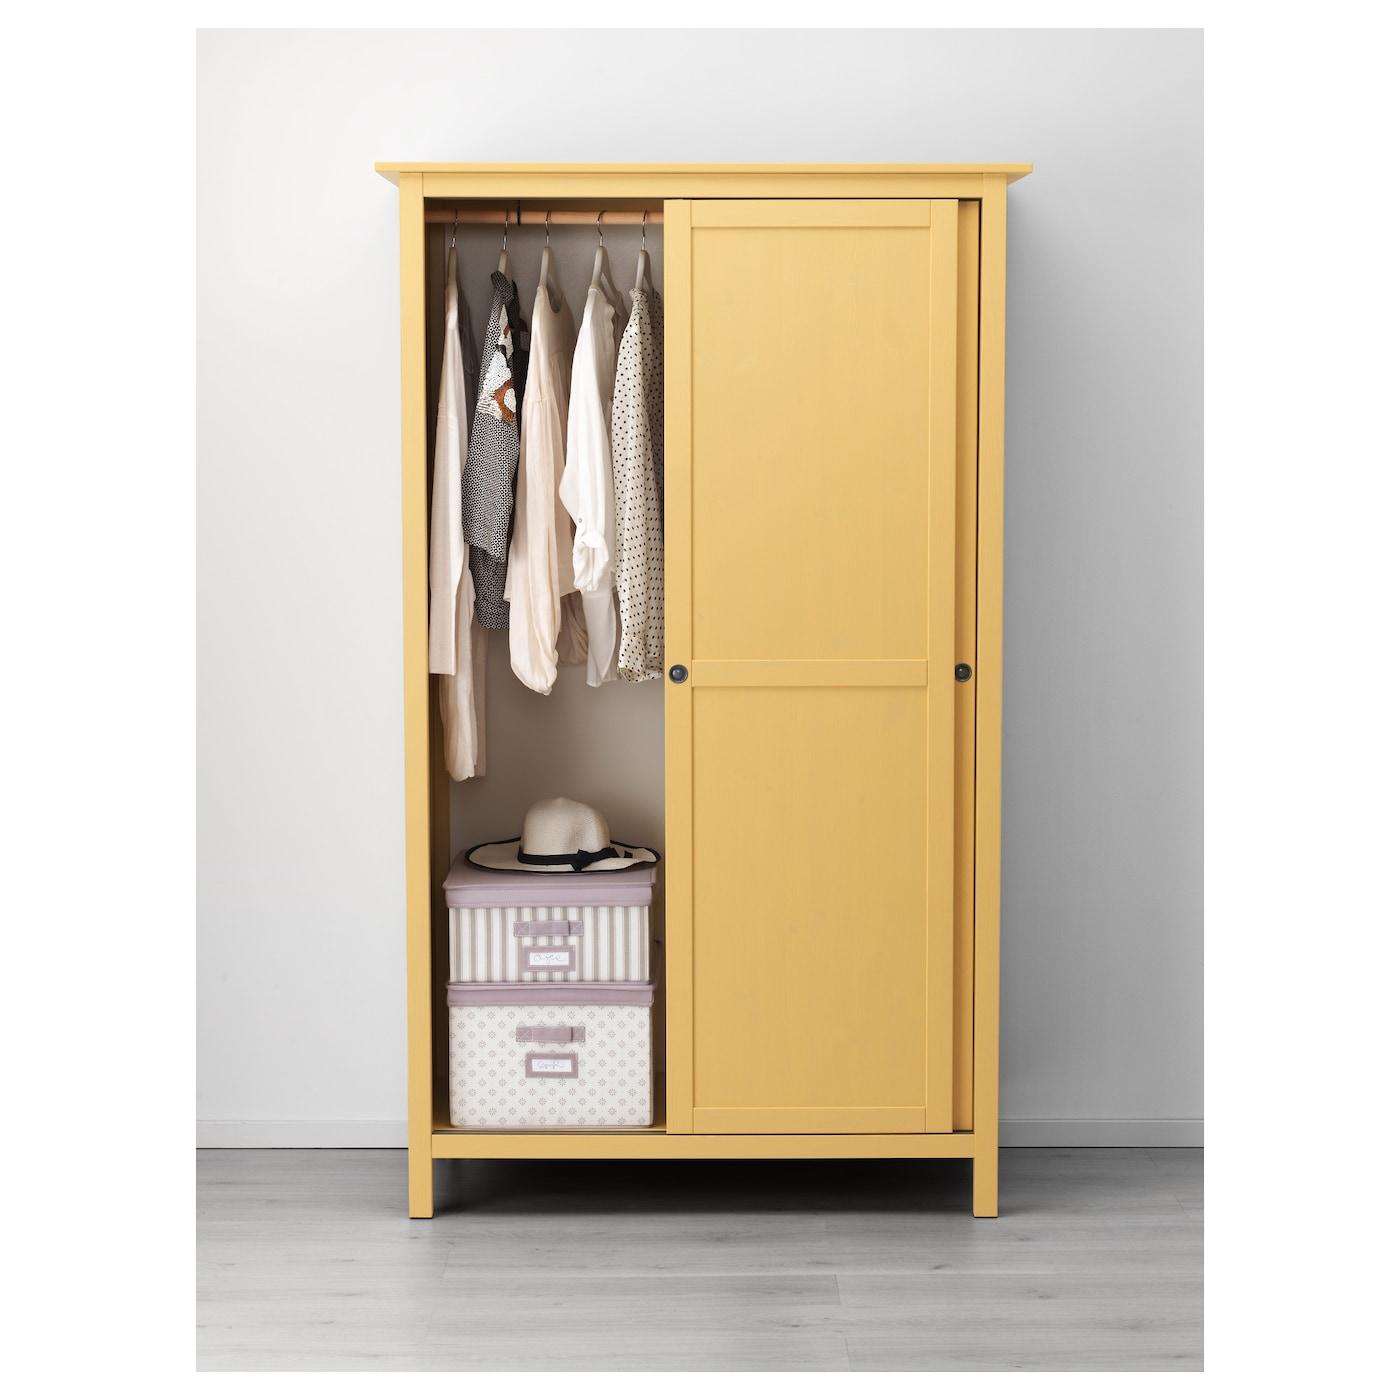 Design Ikea Closet hemnes wardrobe with 2 sliding doors yellow 120x197 cm ikea doors